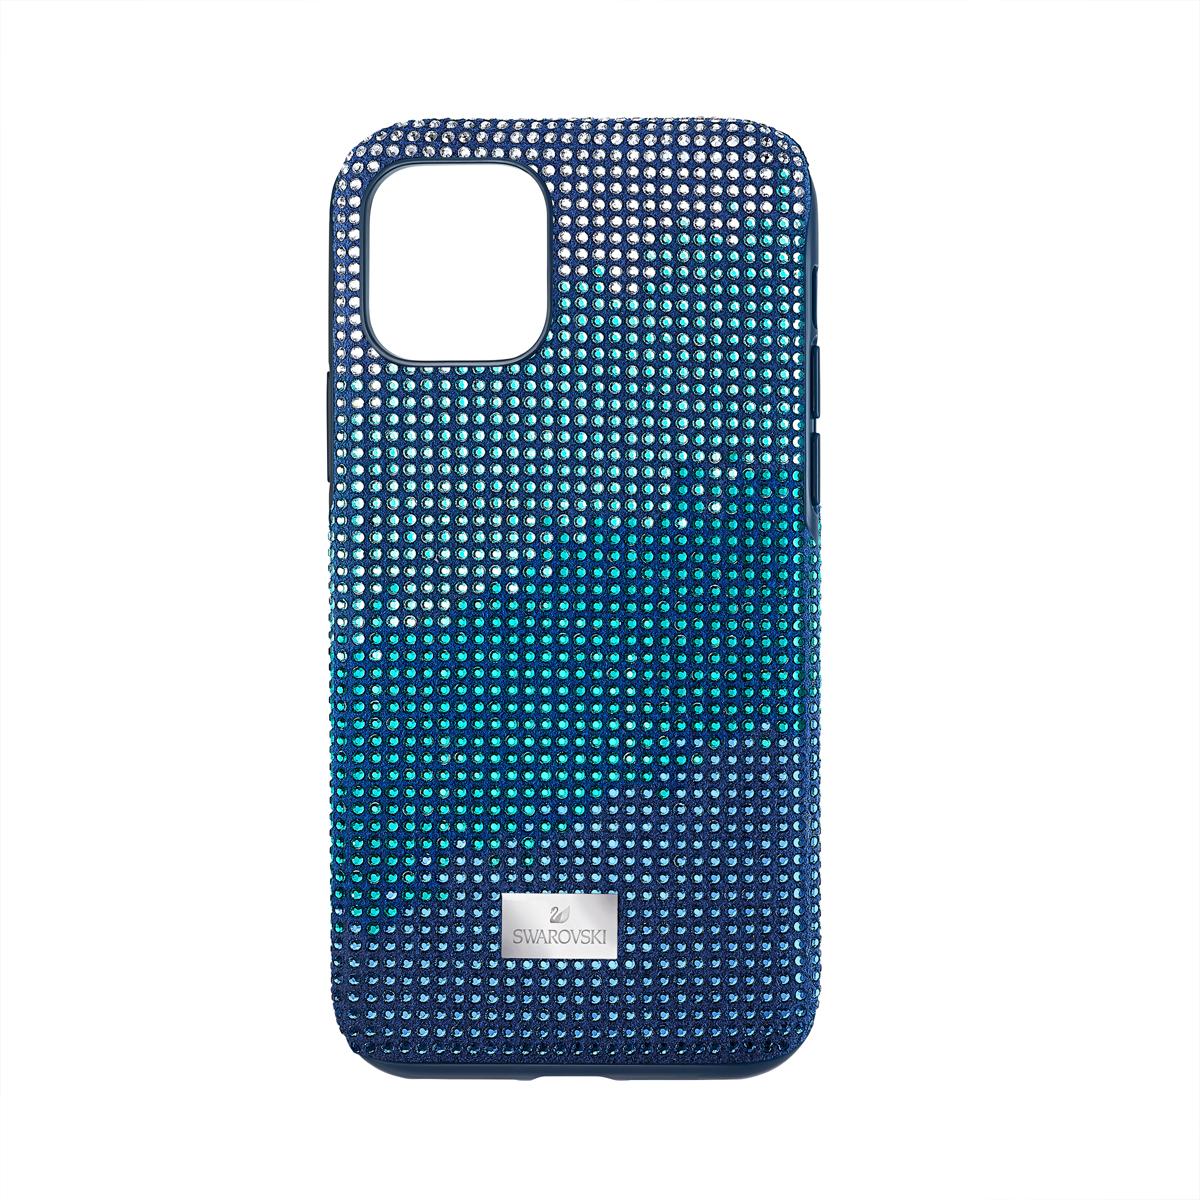 Swarovski Mobile Phone Case Crystalgram iPhone 11 Pro Case Blue Anniversary